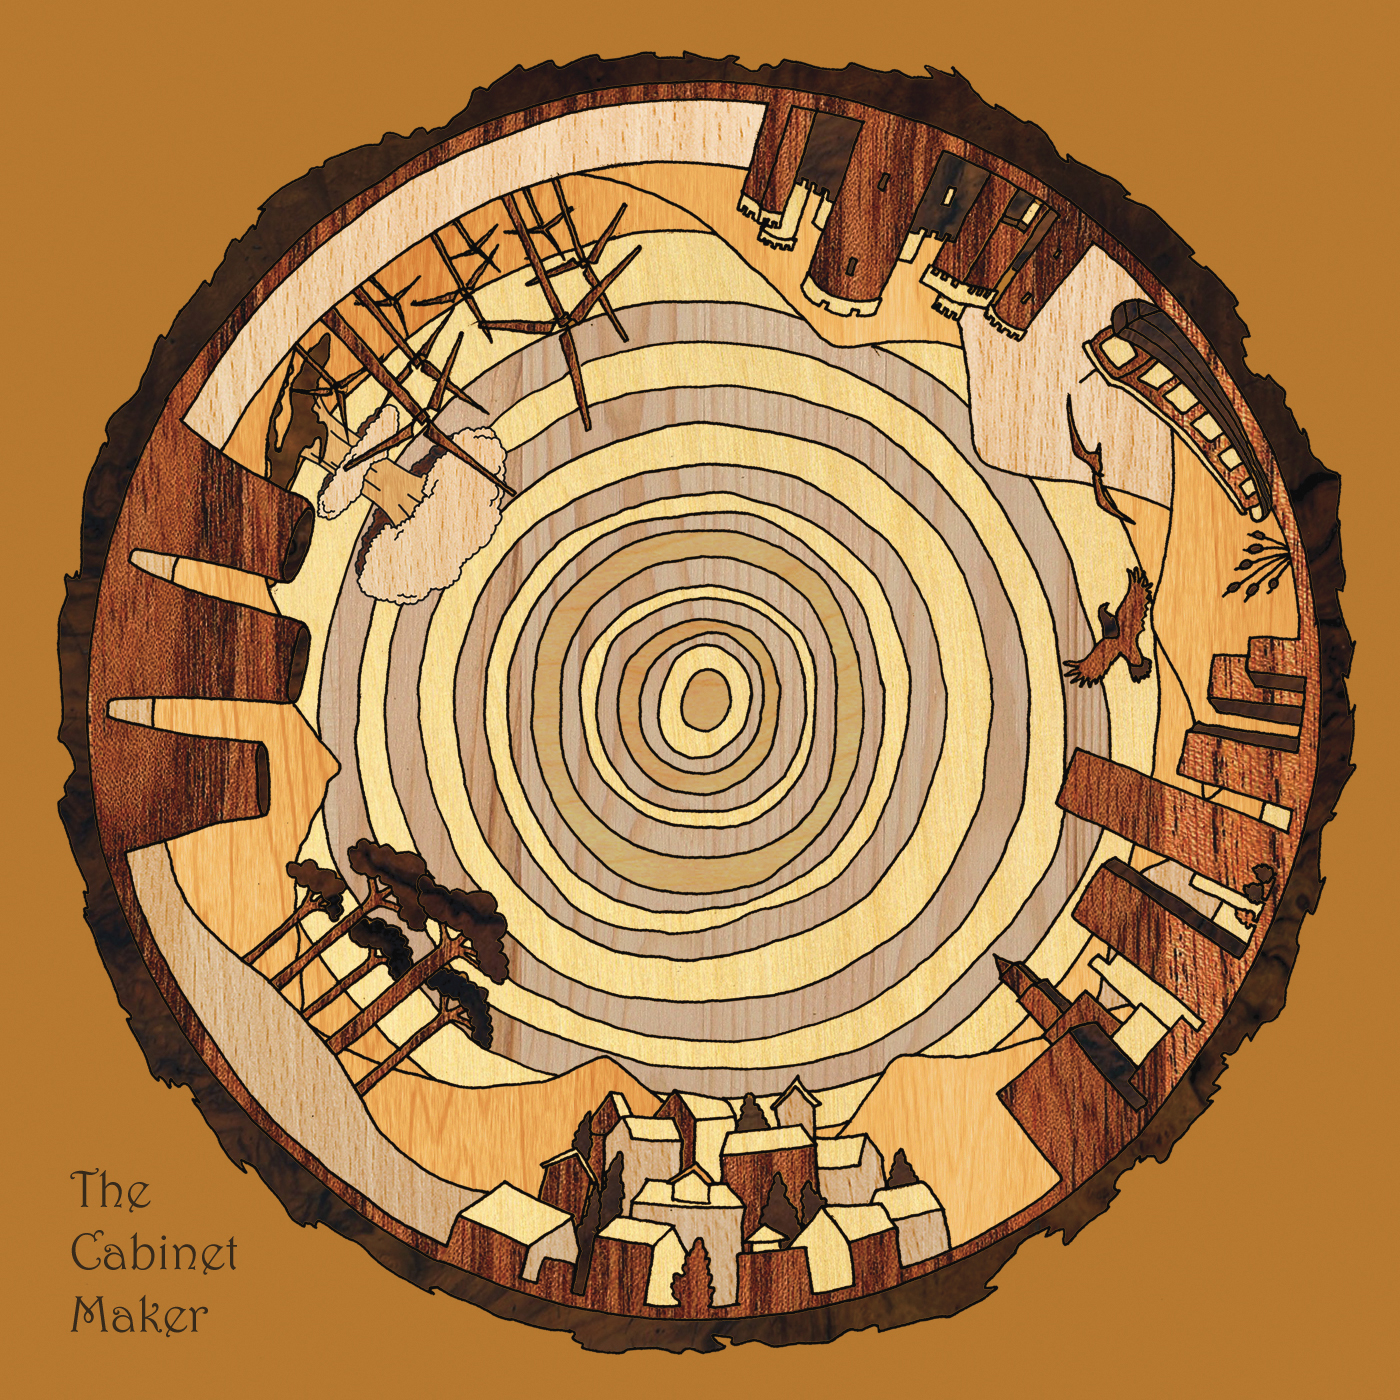 The Cabinet Maker Album Artwork